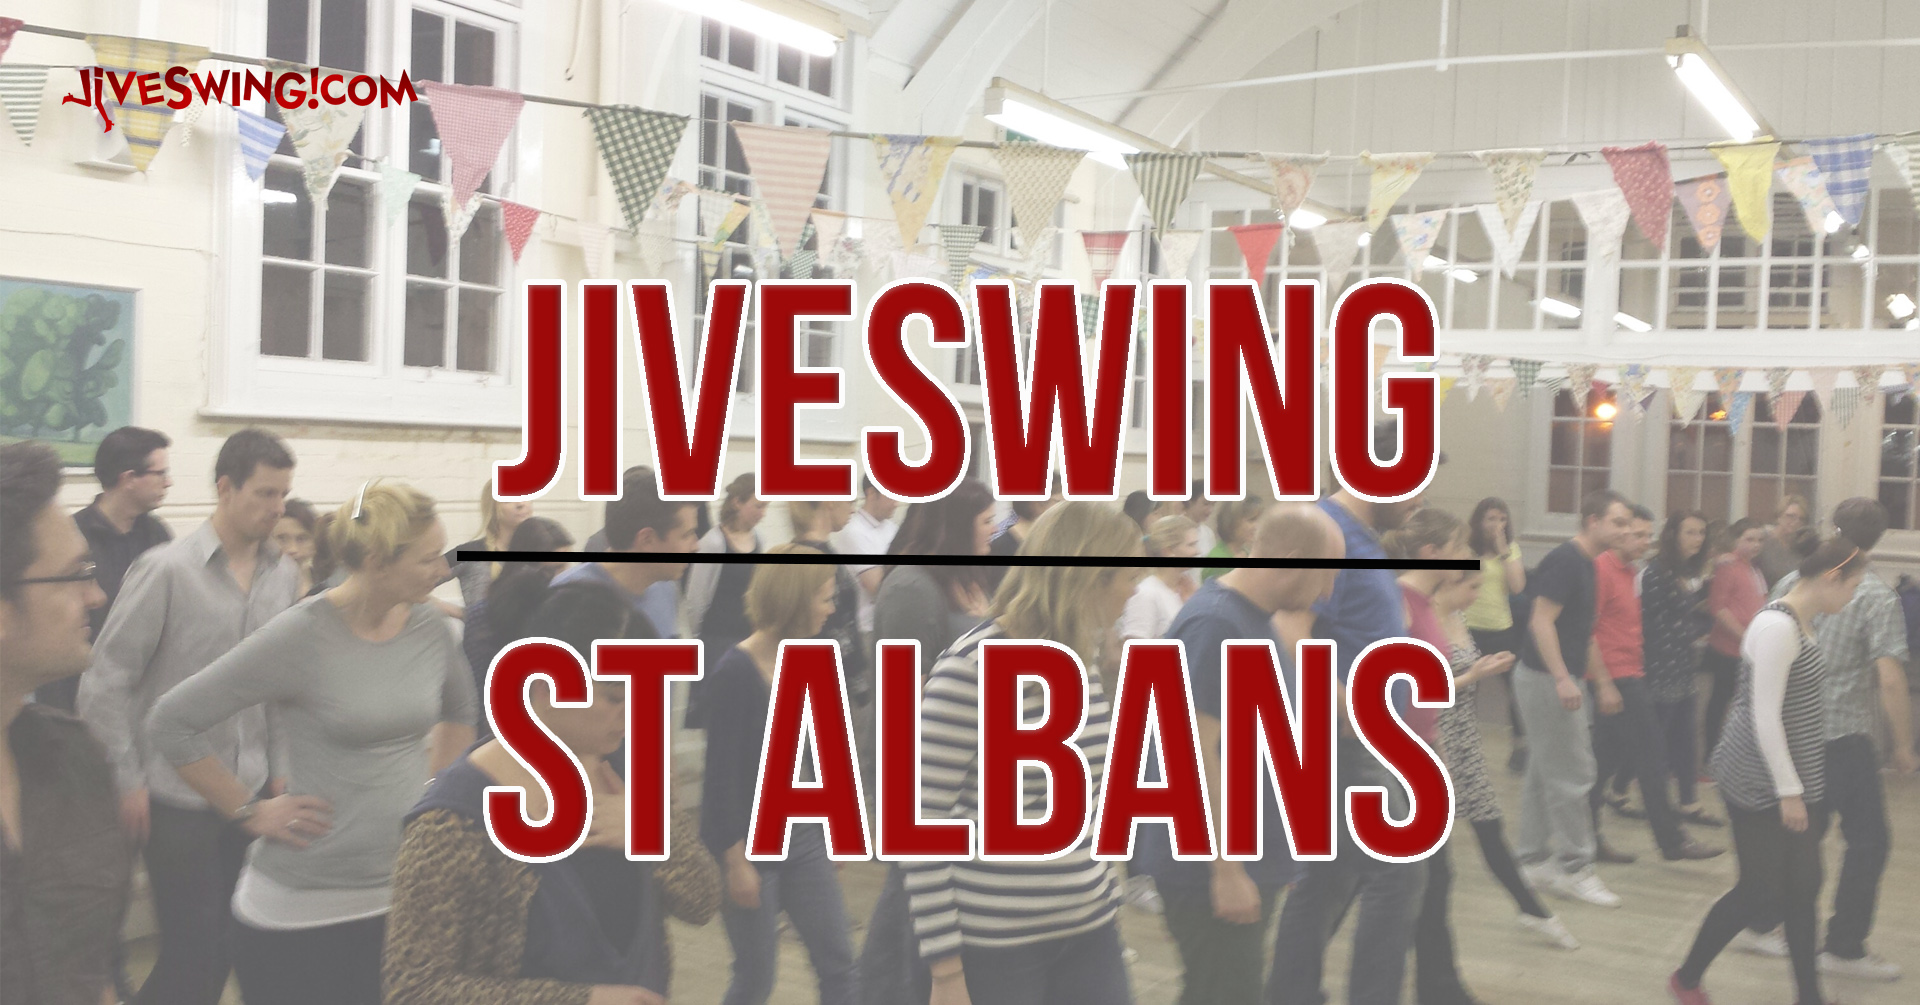 Jiveswing St Albans – 4 Week Course!